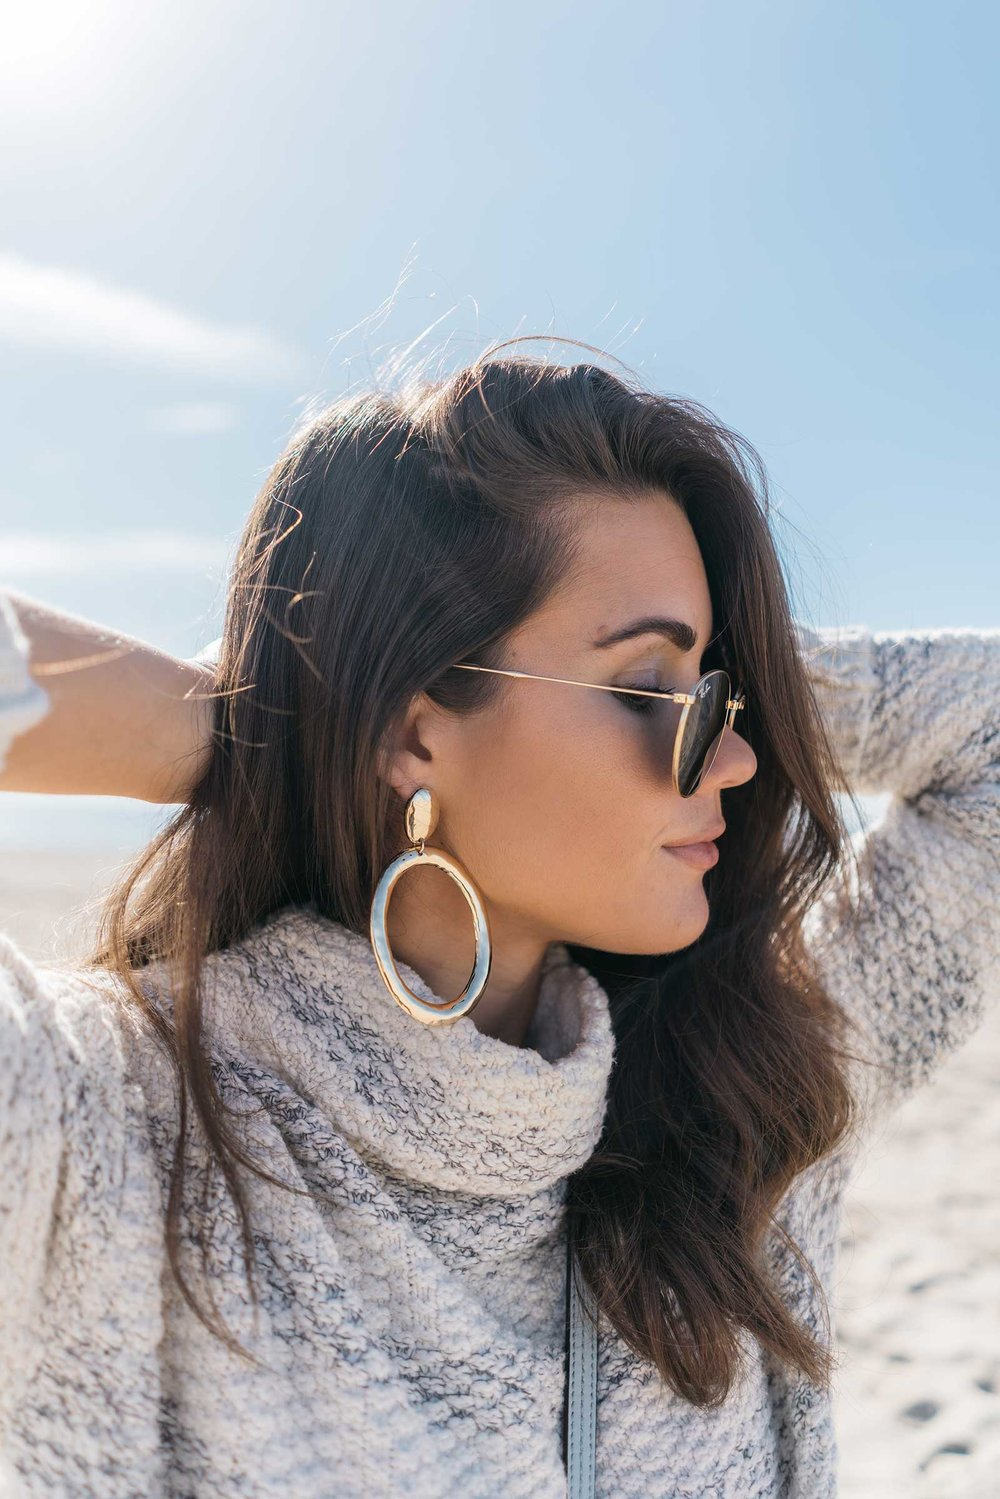 O'Neill-Livie-Striped-Mock-Neck-Sweater-Chloe-Faye-Small-Leather-Bracelet-Bag-Ray-Ban-53mm-Retro-Sunglasses-7.jpg